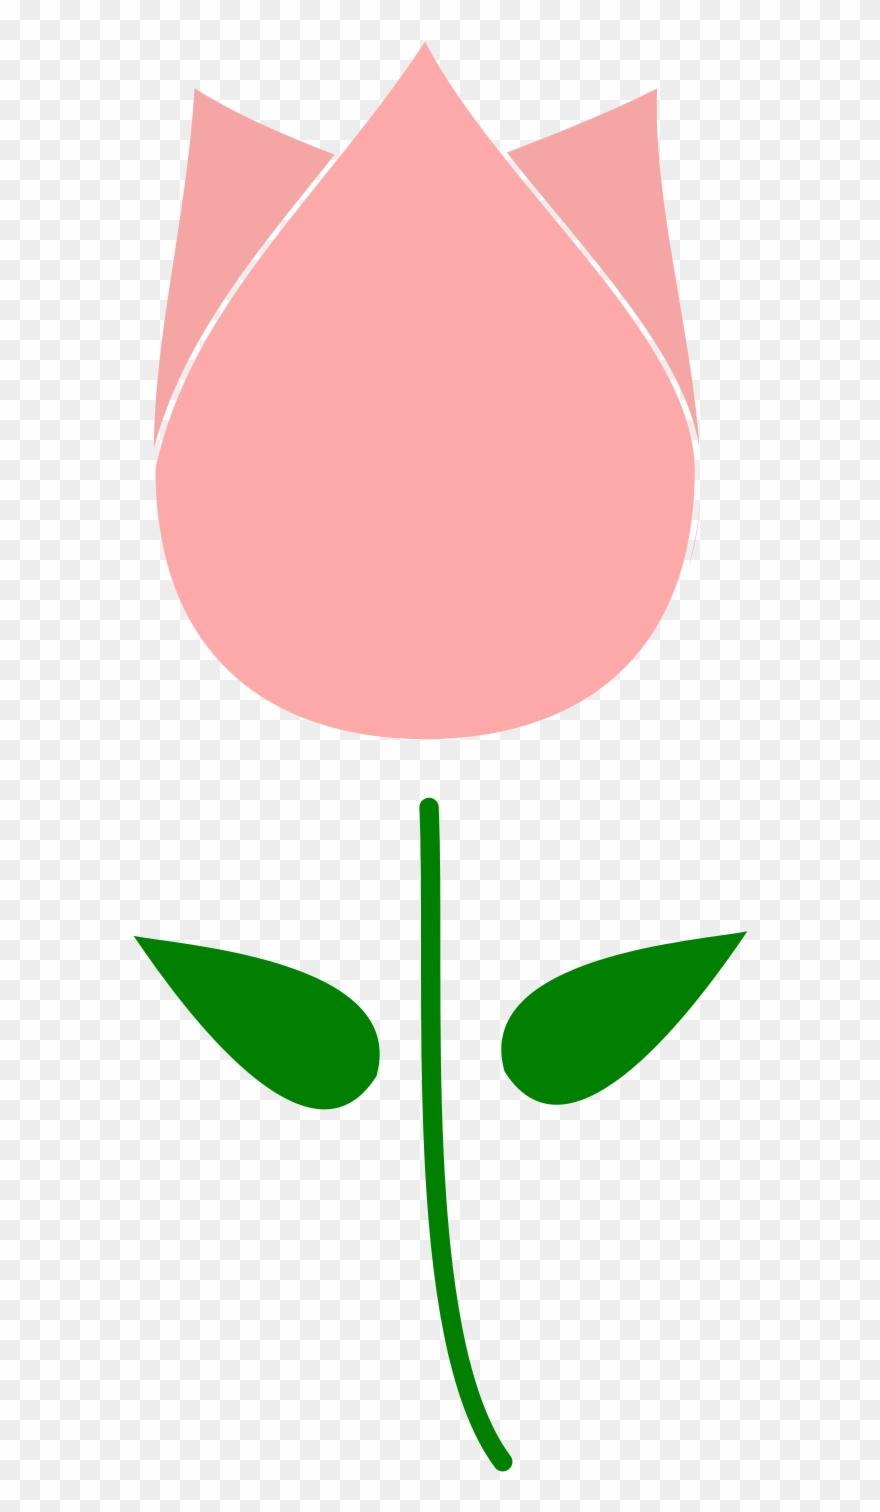 Clipart Tulip Flower.